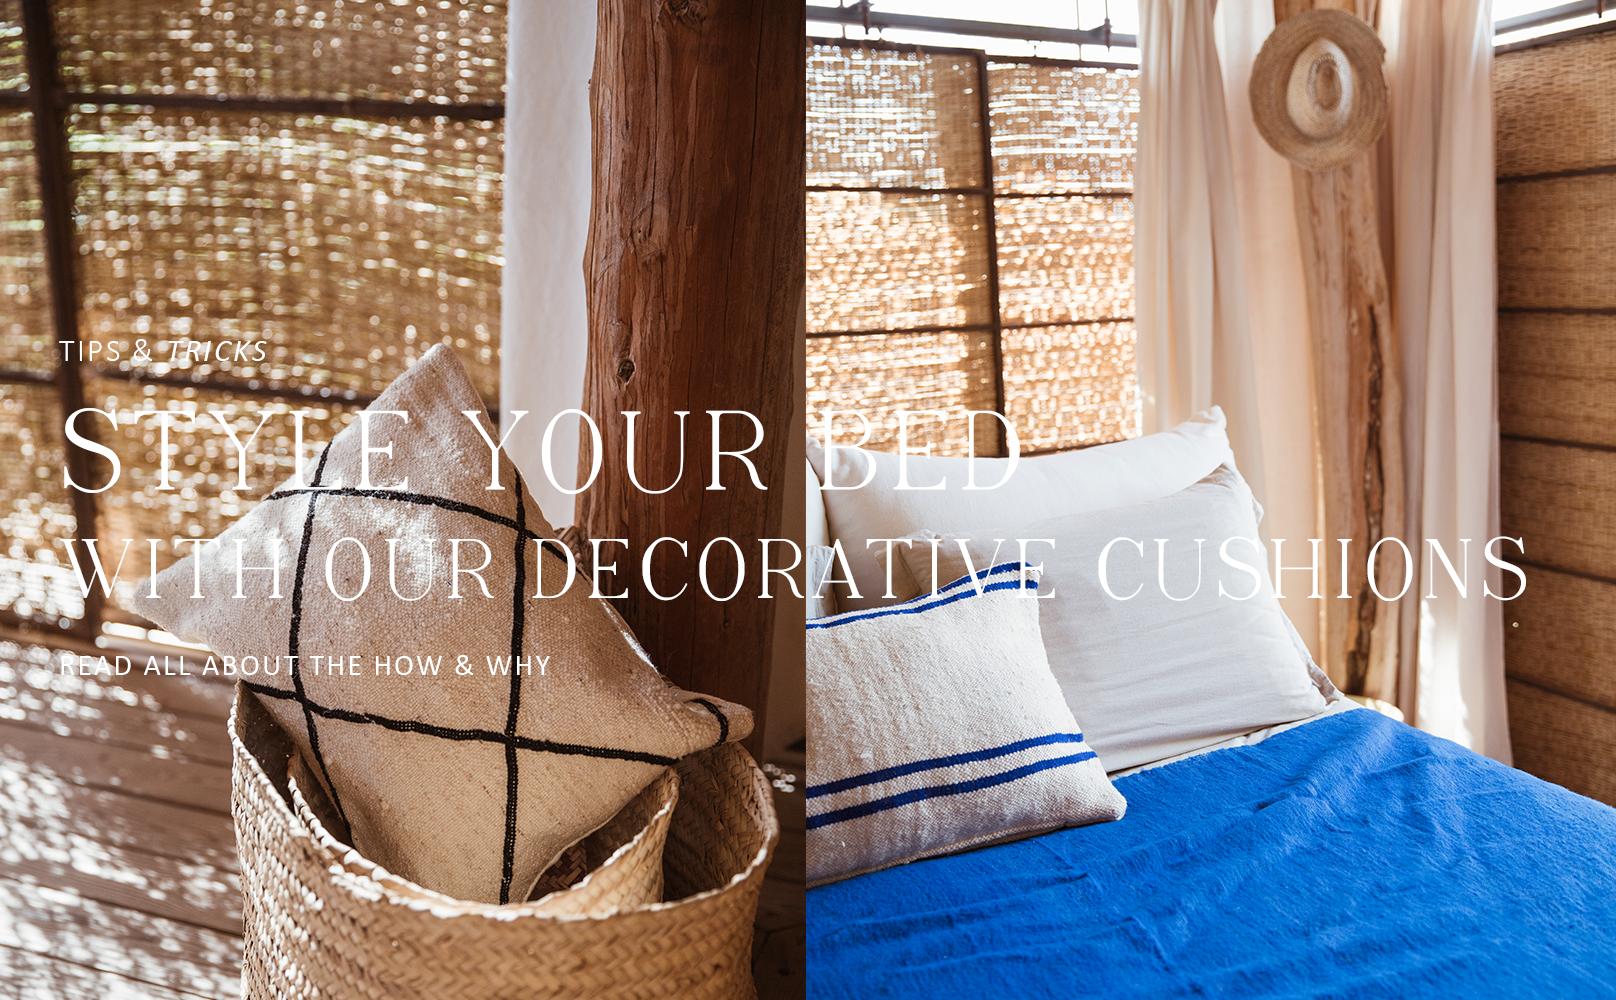 Style je bed met sierkussens